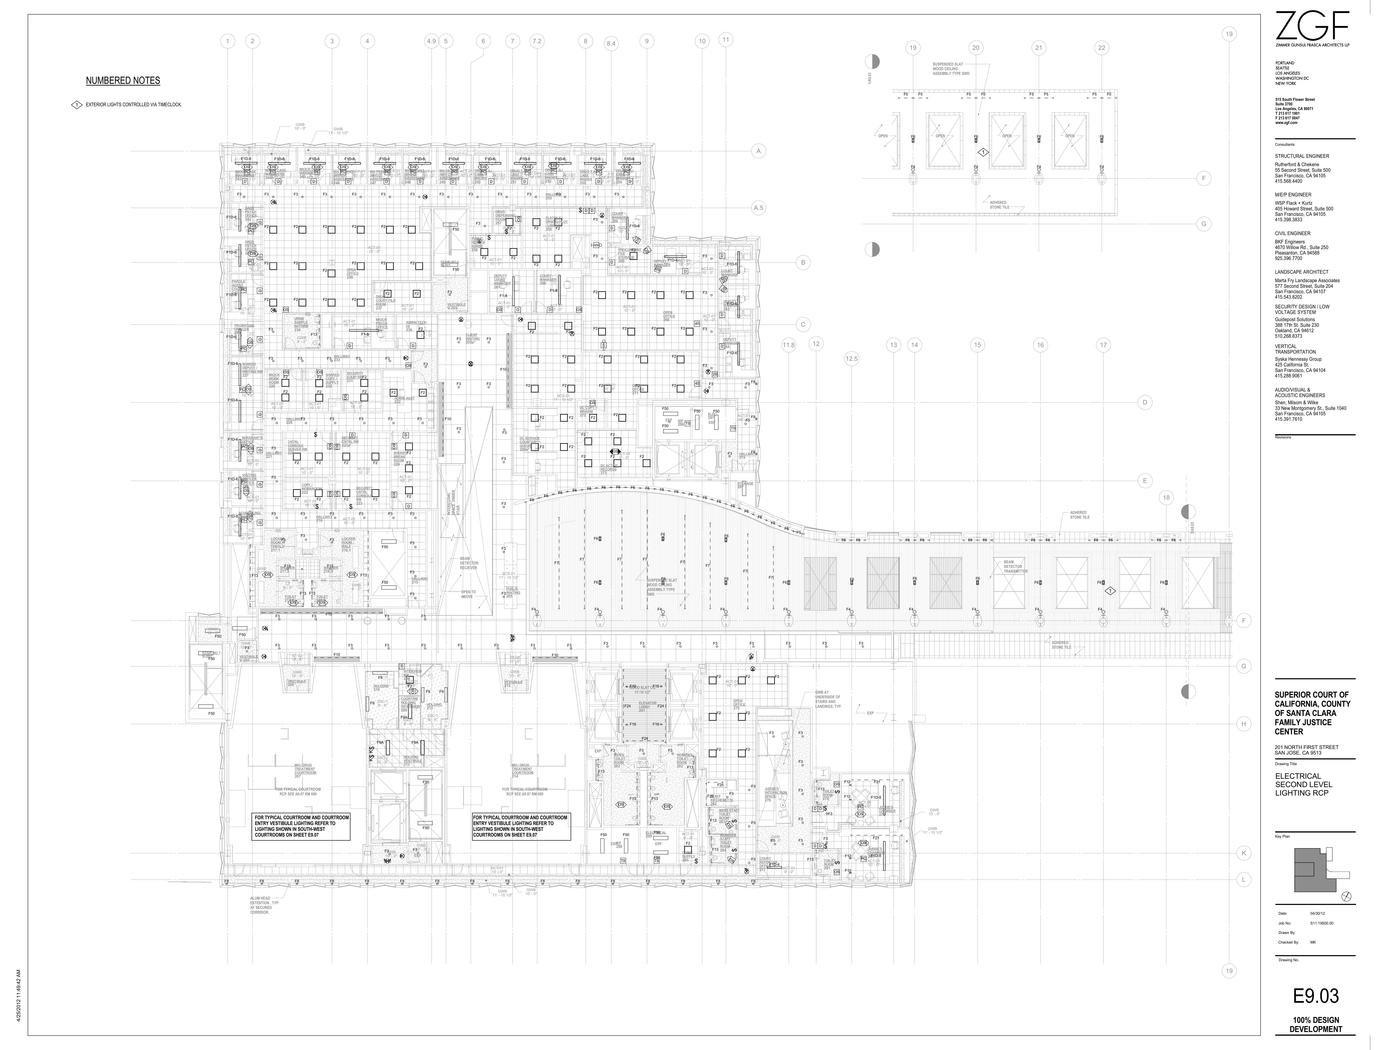 electrical plan on revit wiring diagram database Basic HVAC Wiring Worksheet misc construction documents sketch details by brock soderberg at electrical floor plans in revit electrical plan on revit